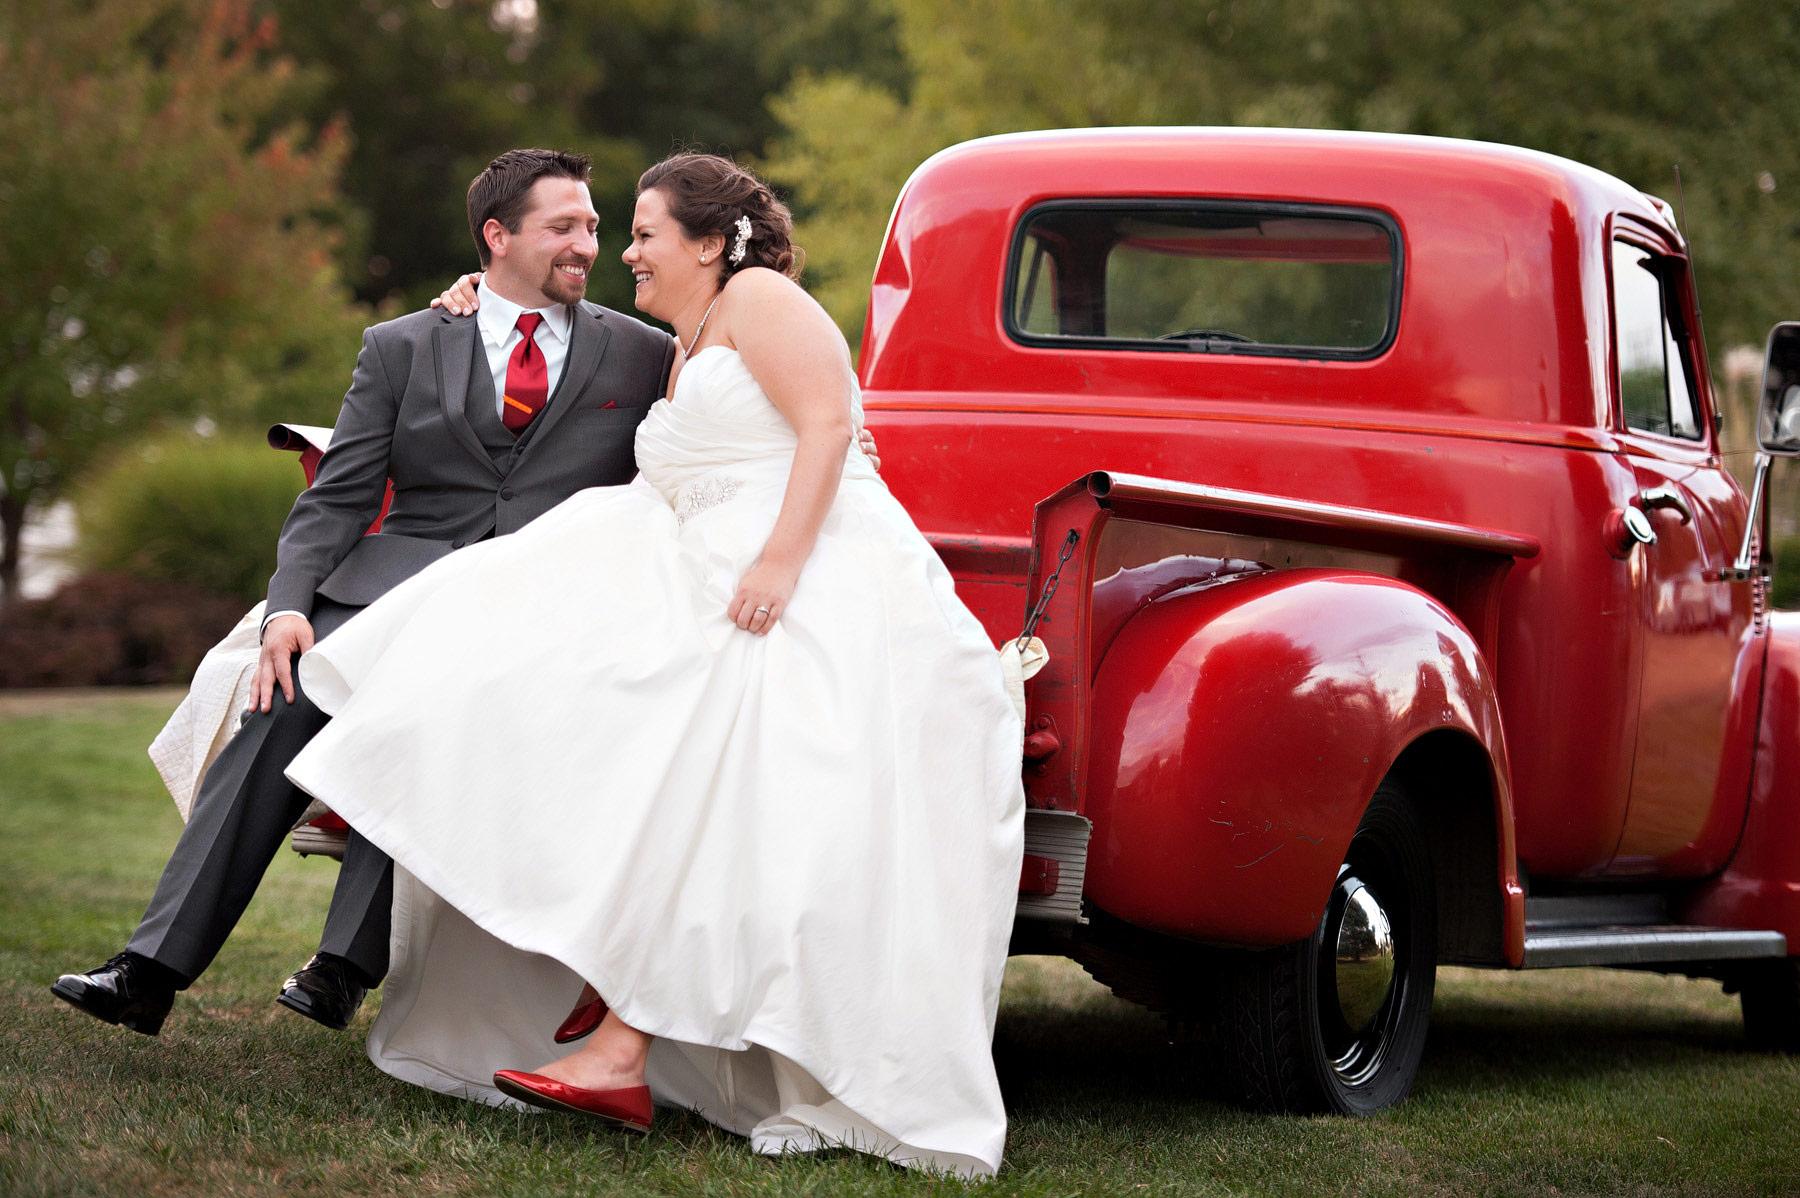 minnesota-wedding-photographers-mark-kegans-939.jpg